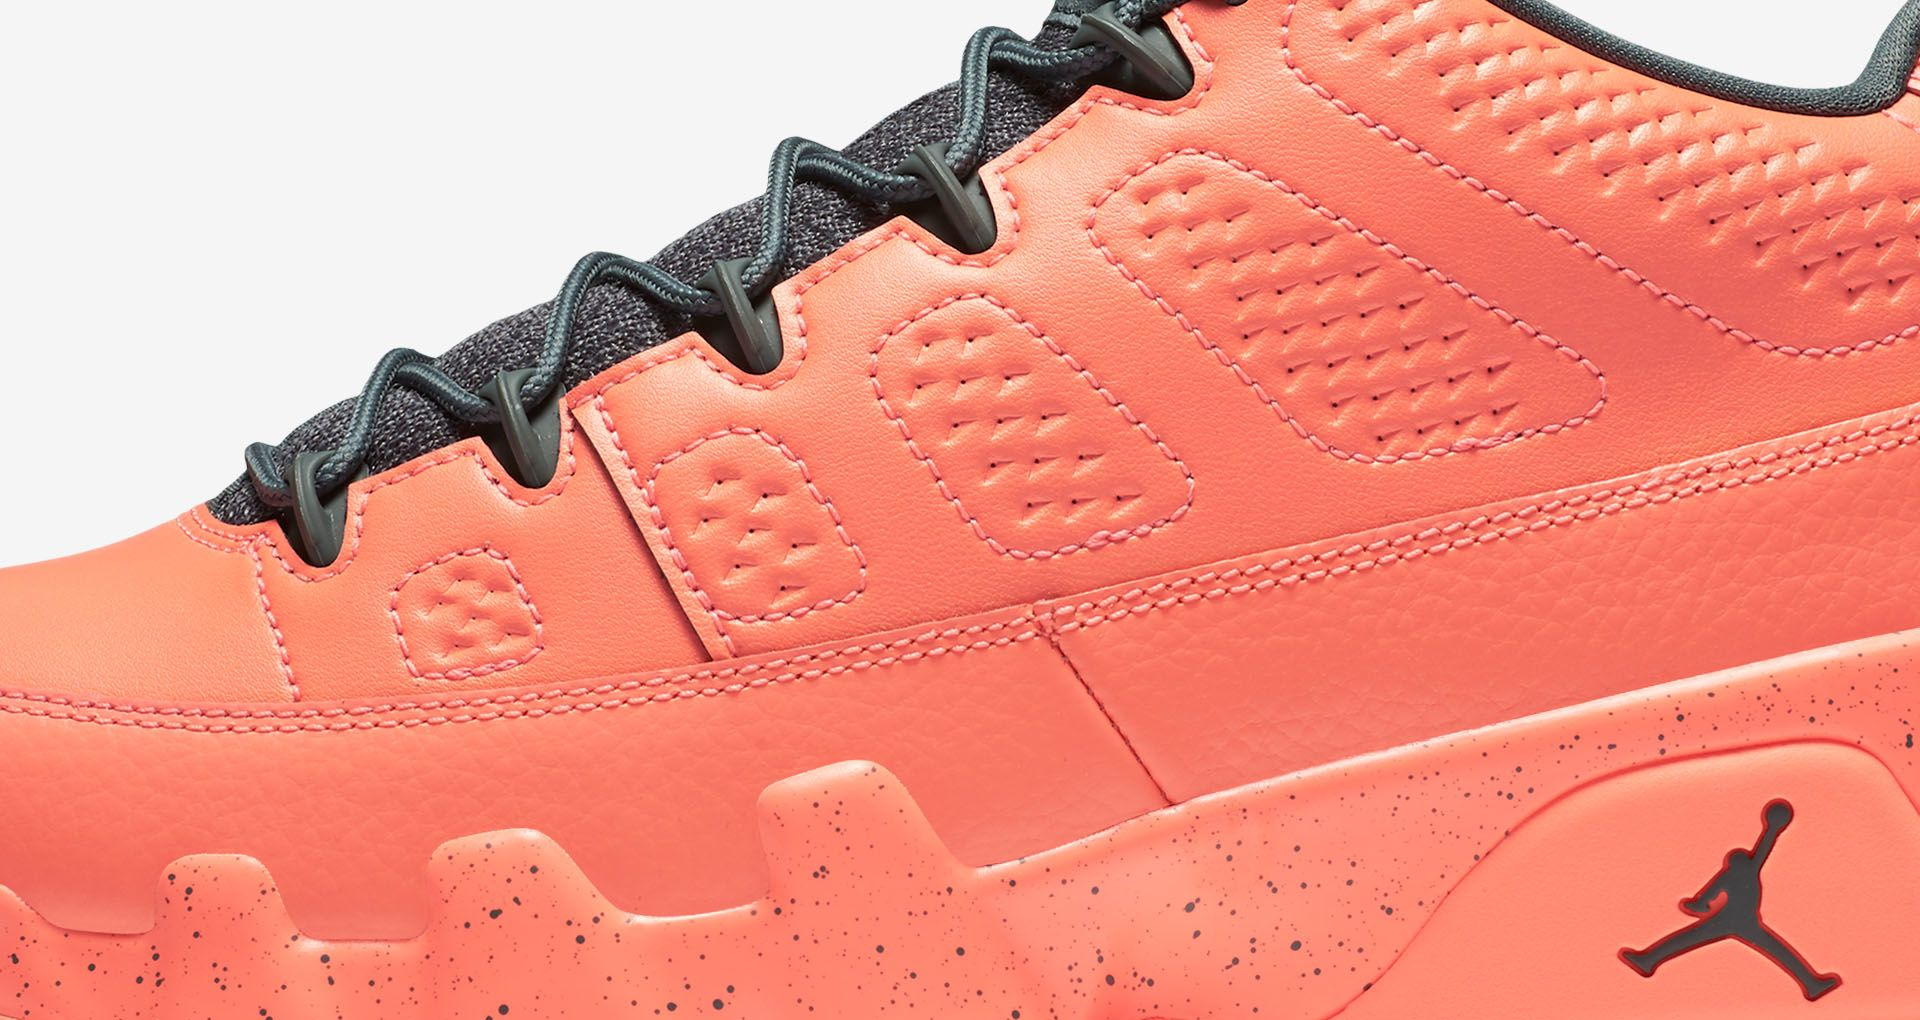 lowest price 594e5 29acf Air Jordan 9 Retro Low  Bright Mango  Release Date